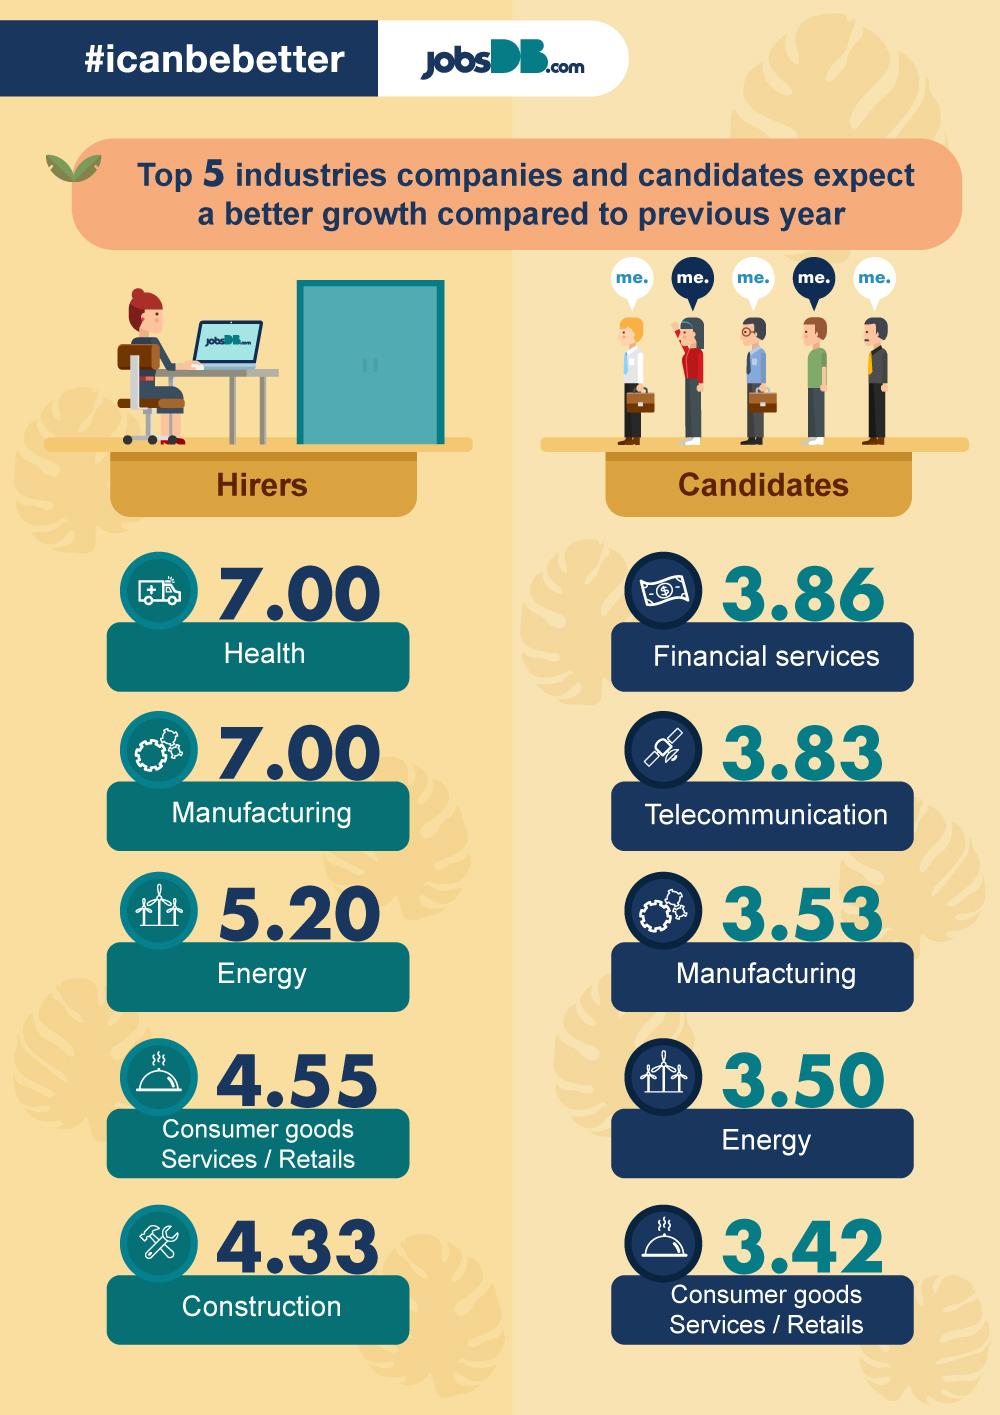 job-market-outlook-2